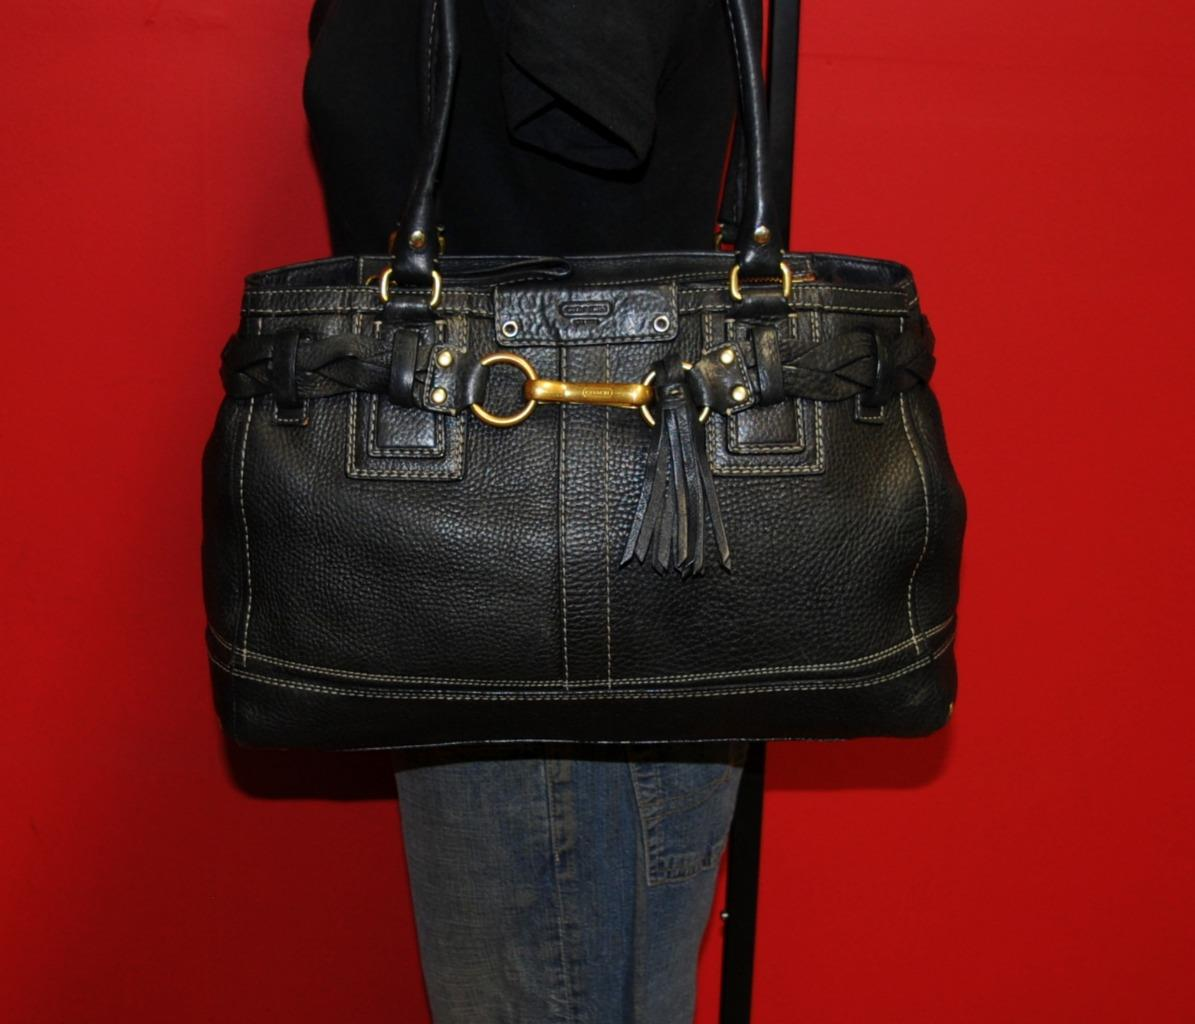 COACH Black Pebbled Leather HAMPTONS Satchel Tote Shoulder ...